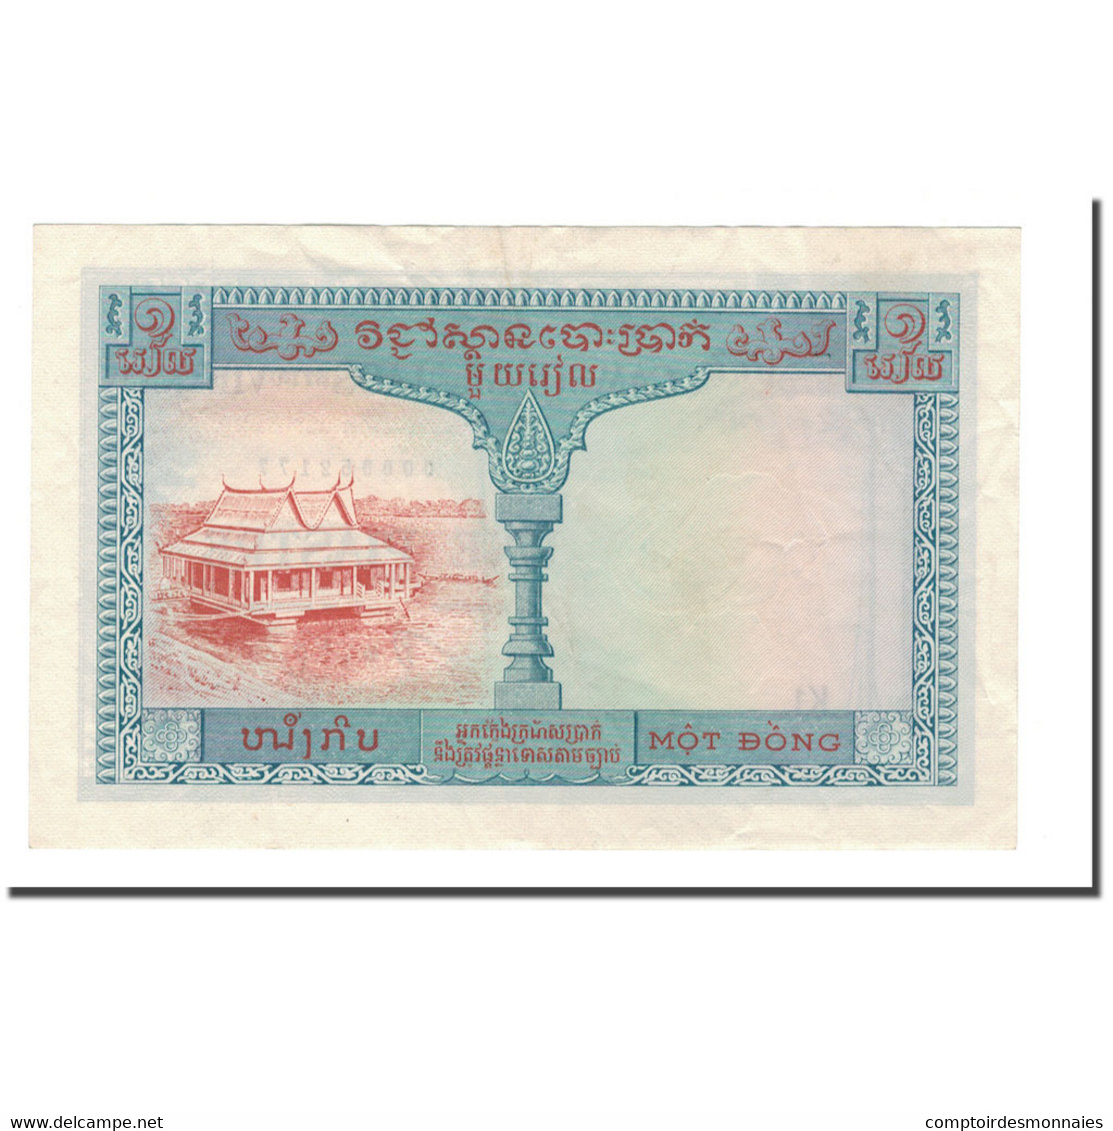 Billet, FRENCH INDO-CHINA, 1 Piastre = 1 Kip, 1954, KM:100, SUP - Indochine